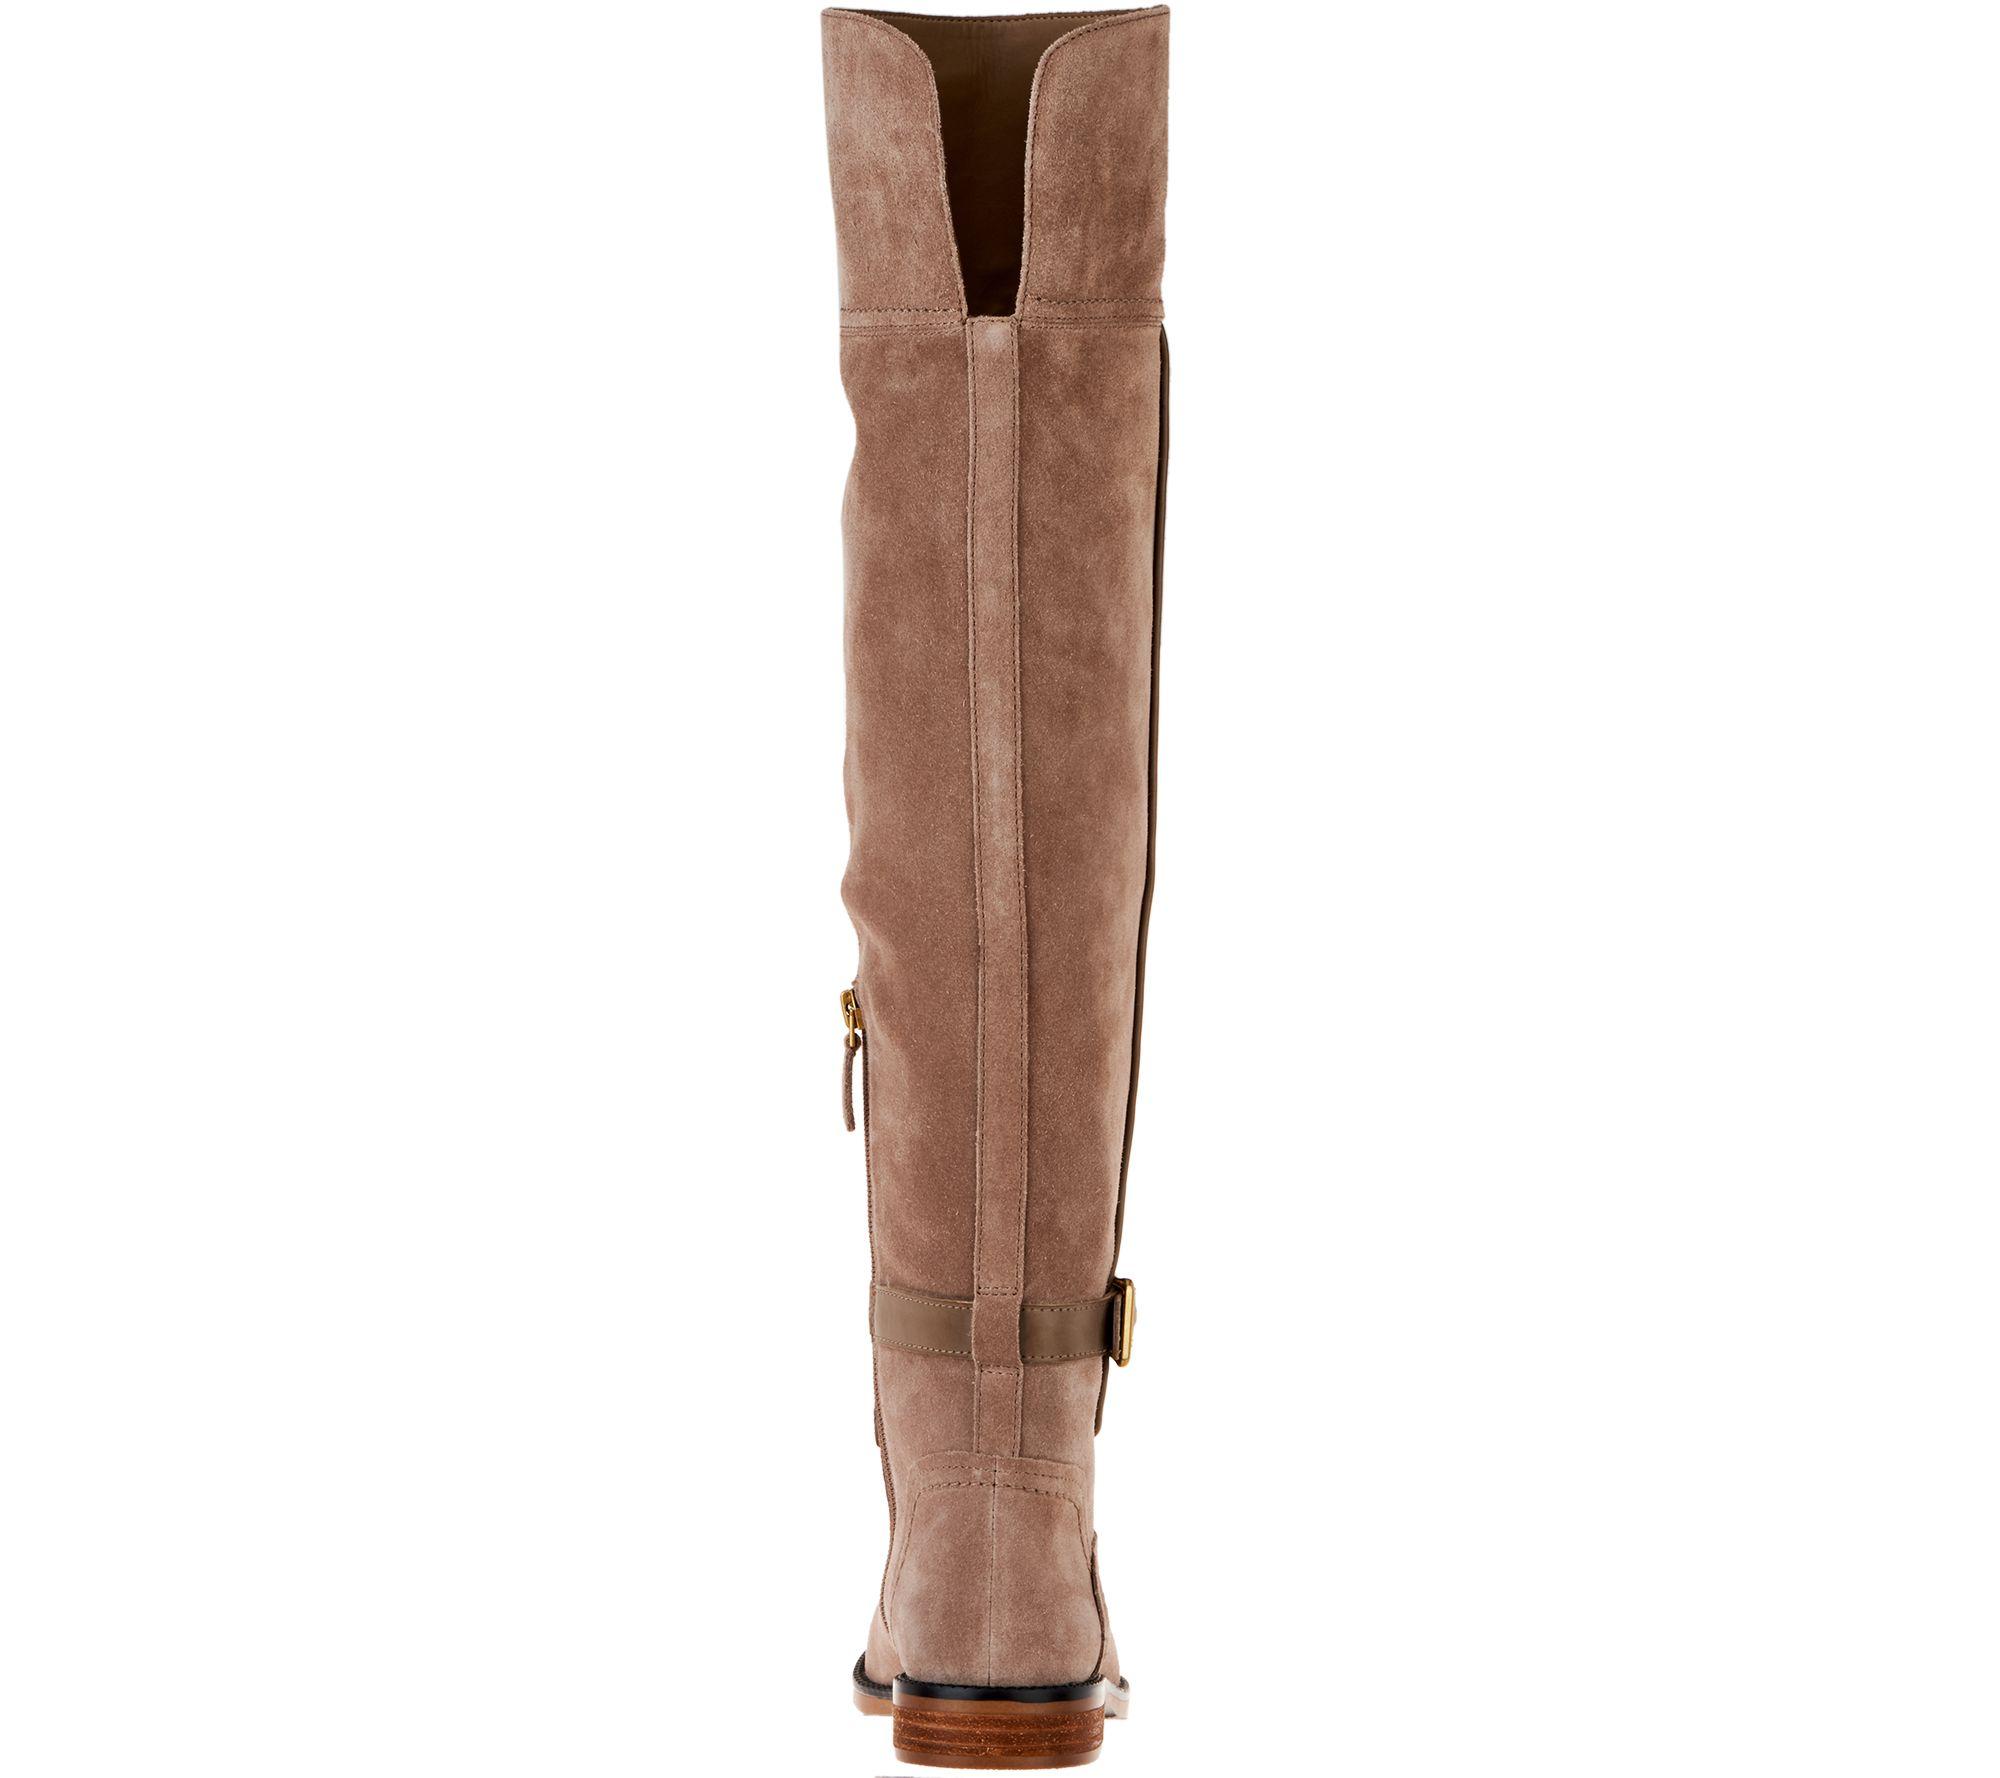 9445d583ccf Franco Sarto Wide Calf Suede Over-the-Knee Boots - Crimson - Page 1 —  QVC.com